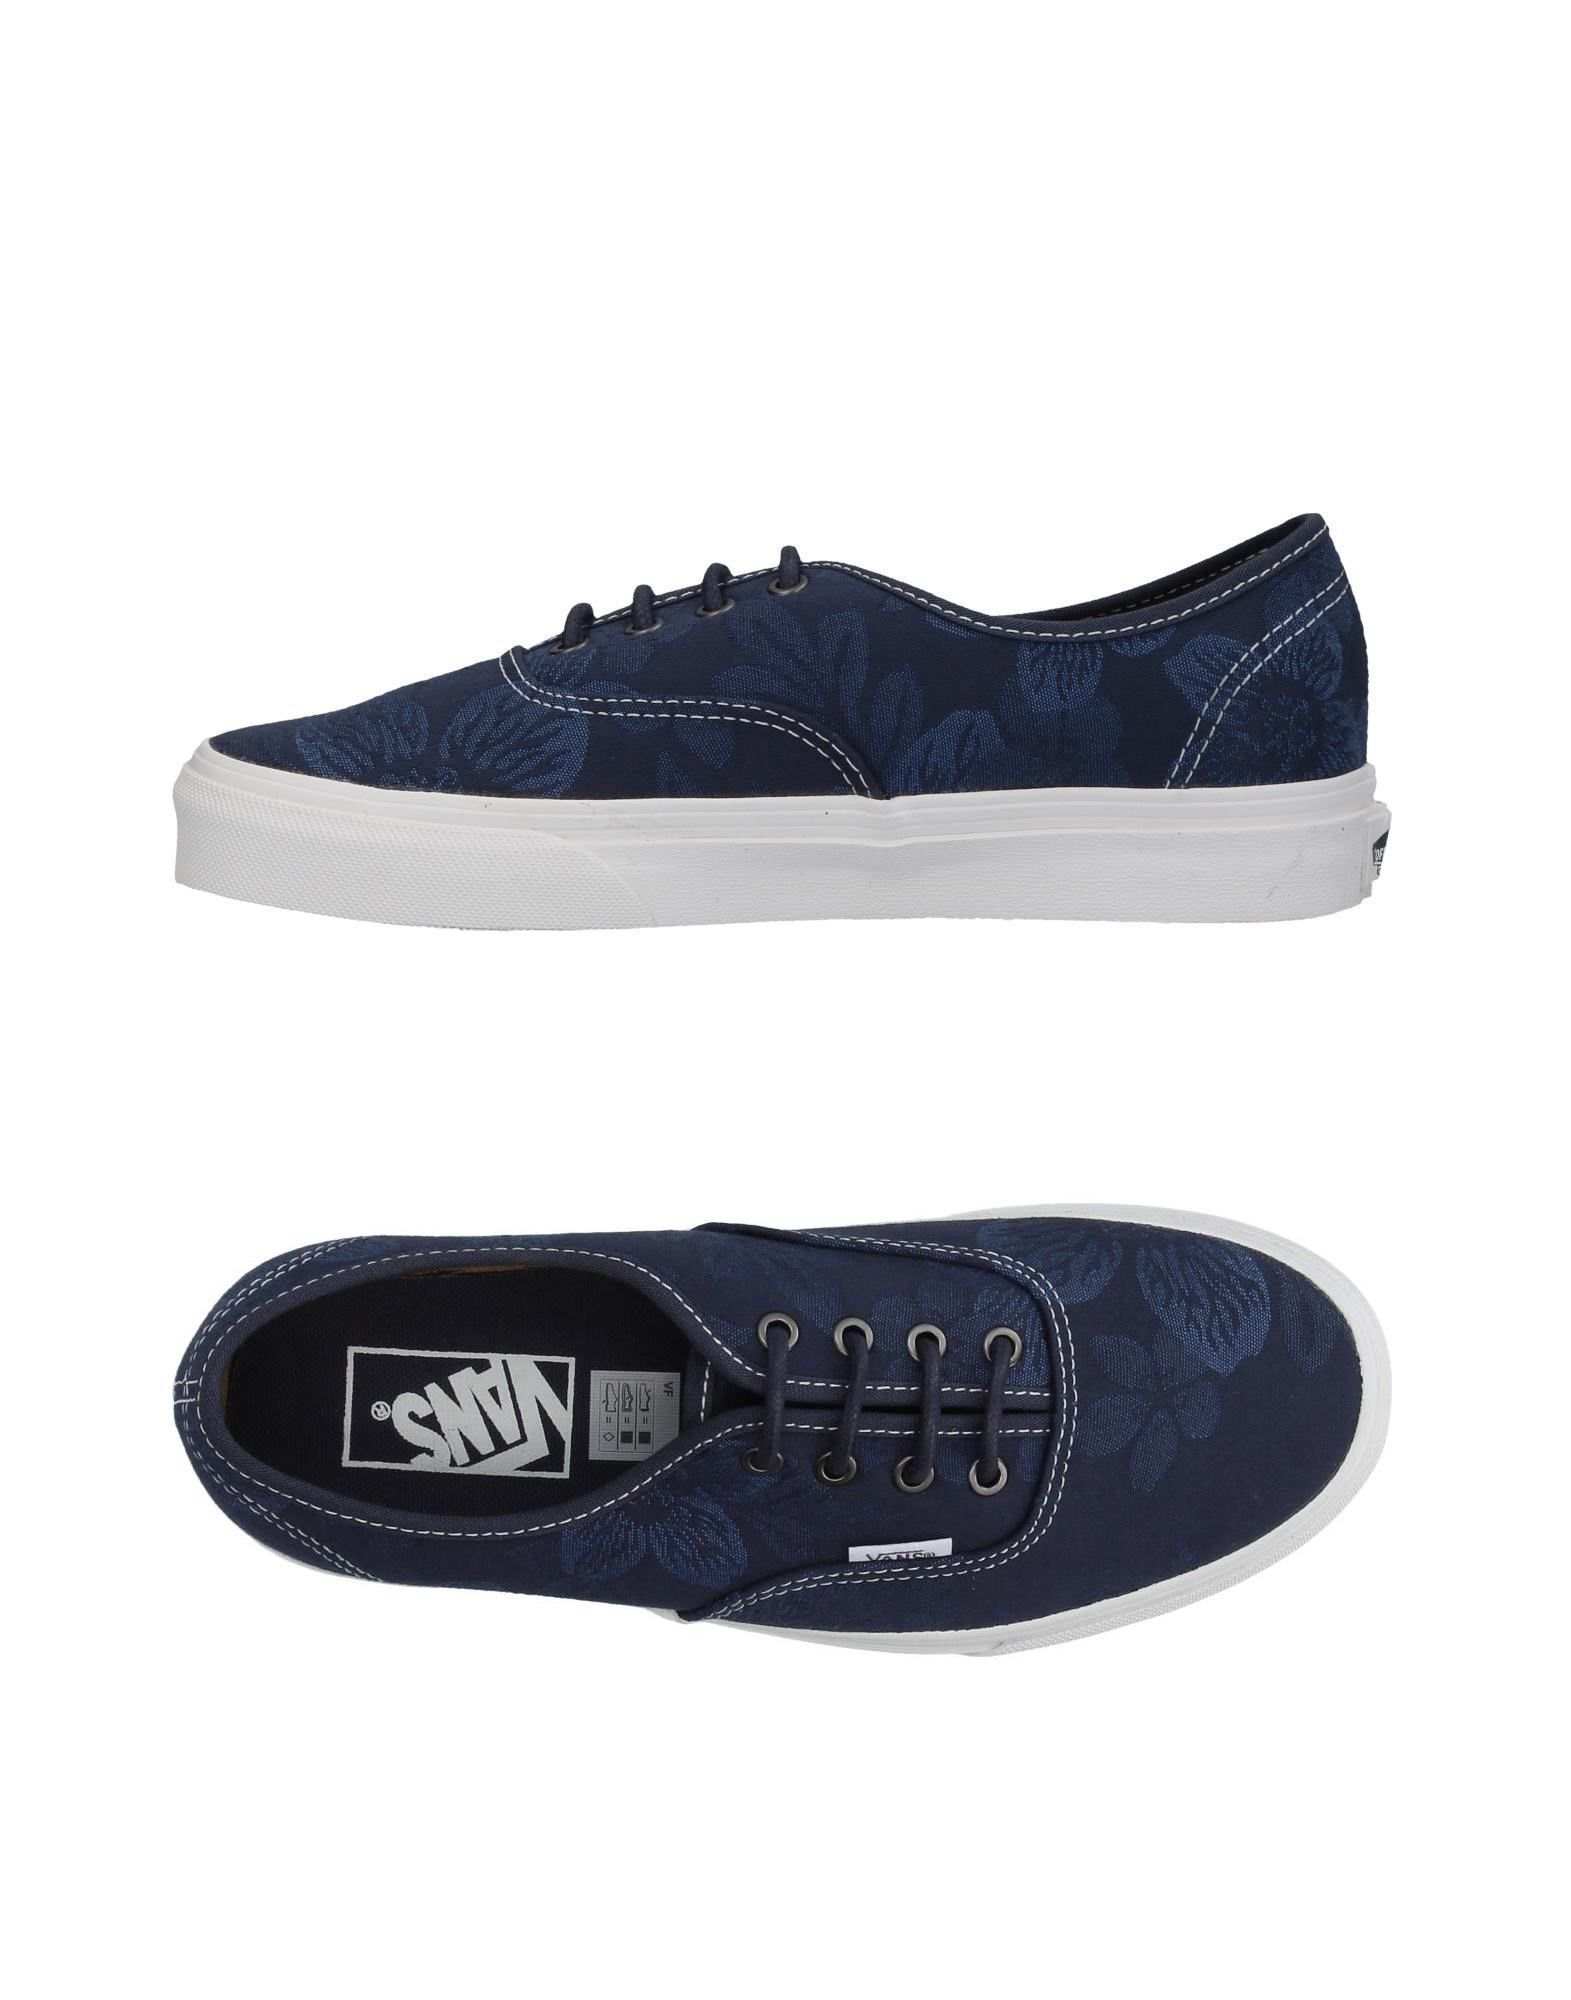 Vans Sneakers Damen  11393731GK Gute Qualität beliebte Schuhe